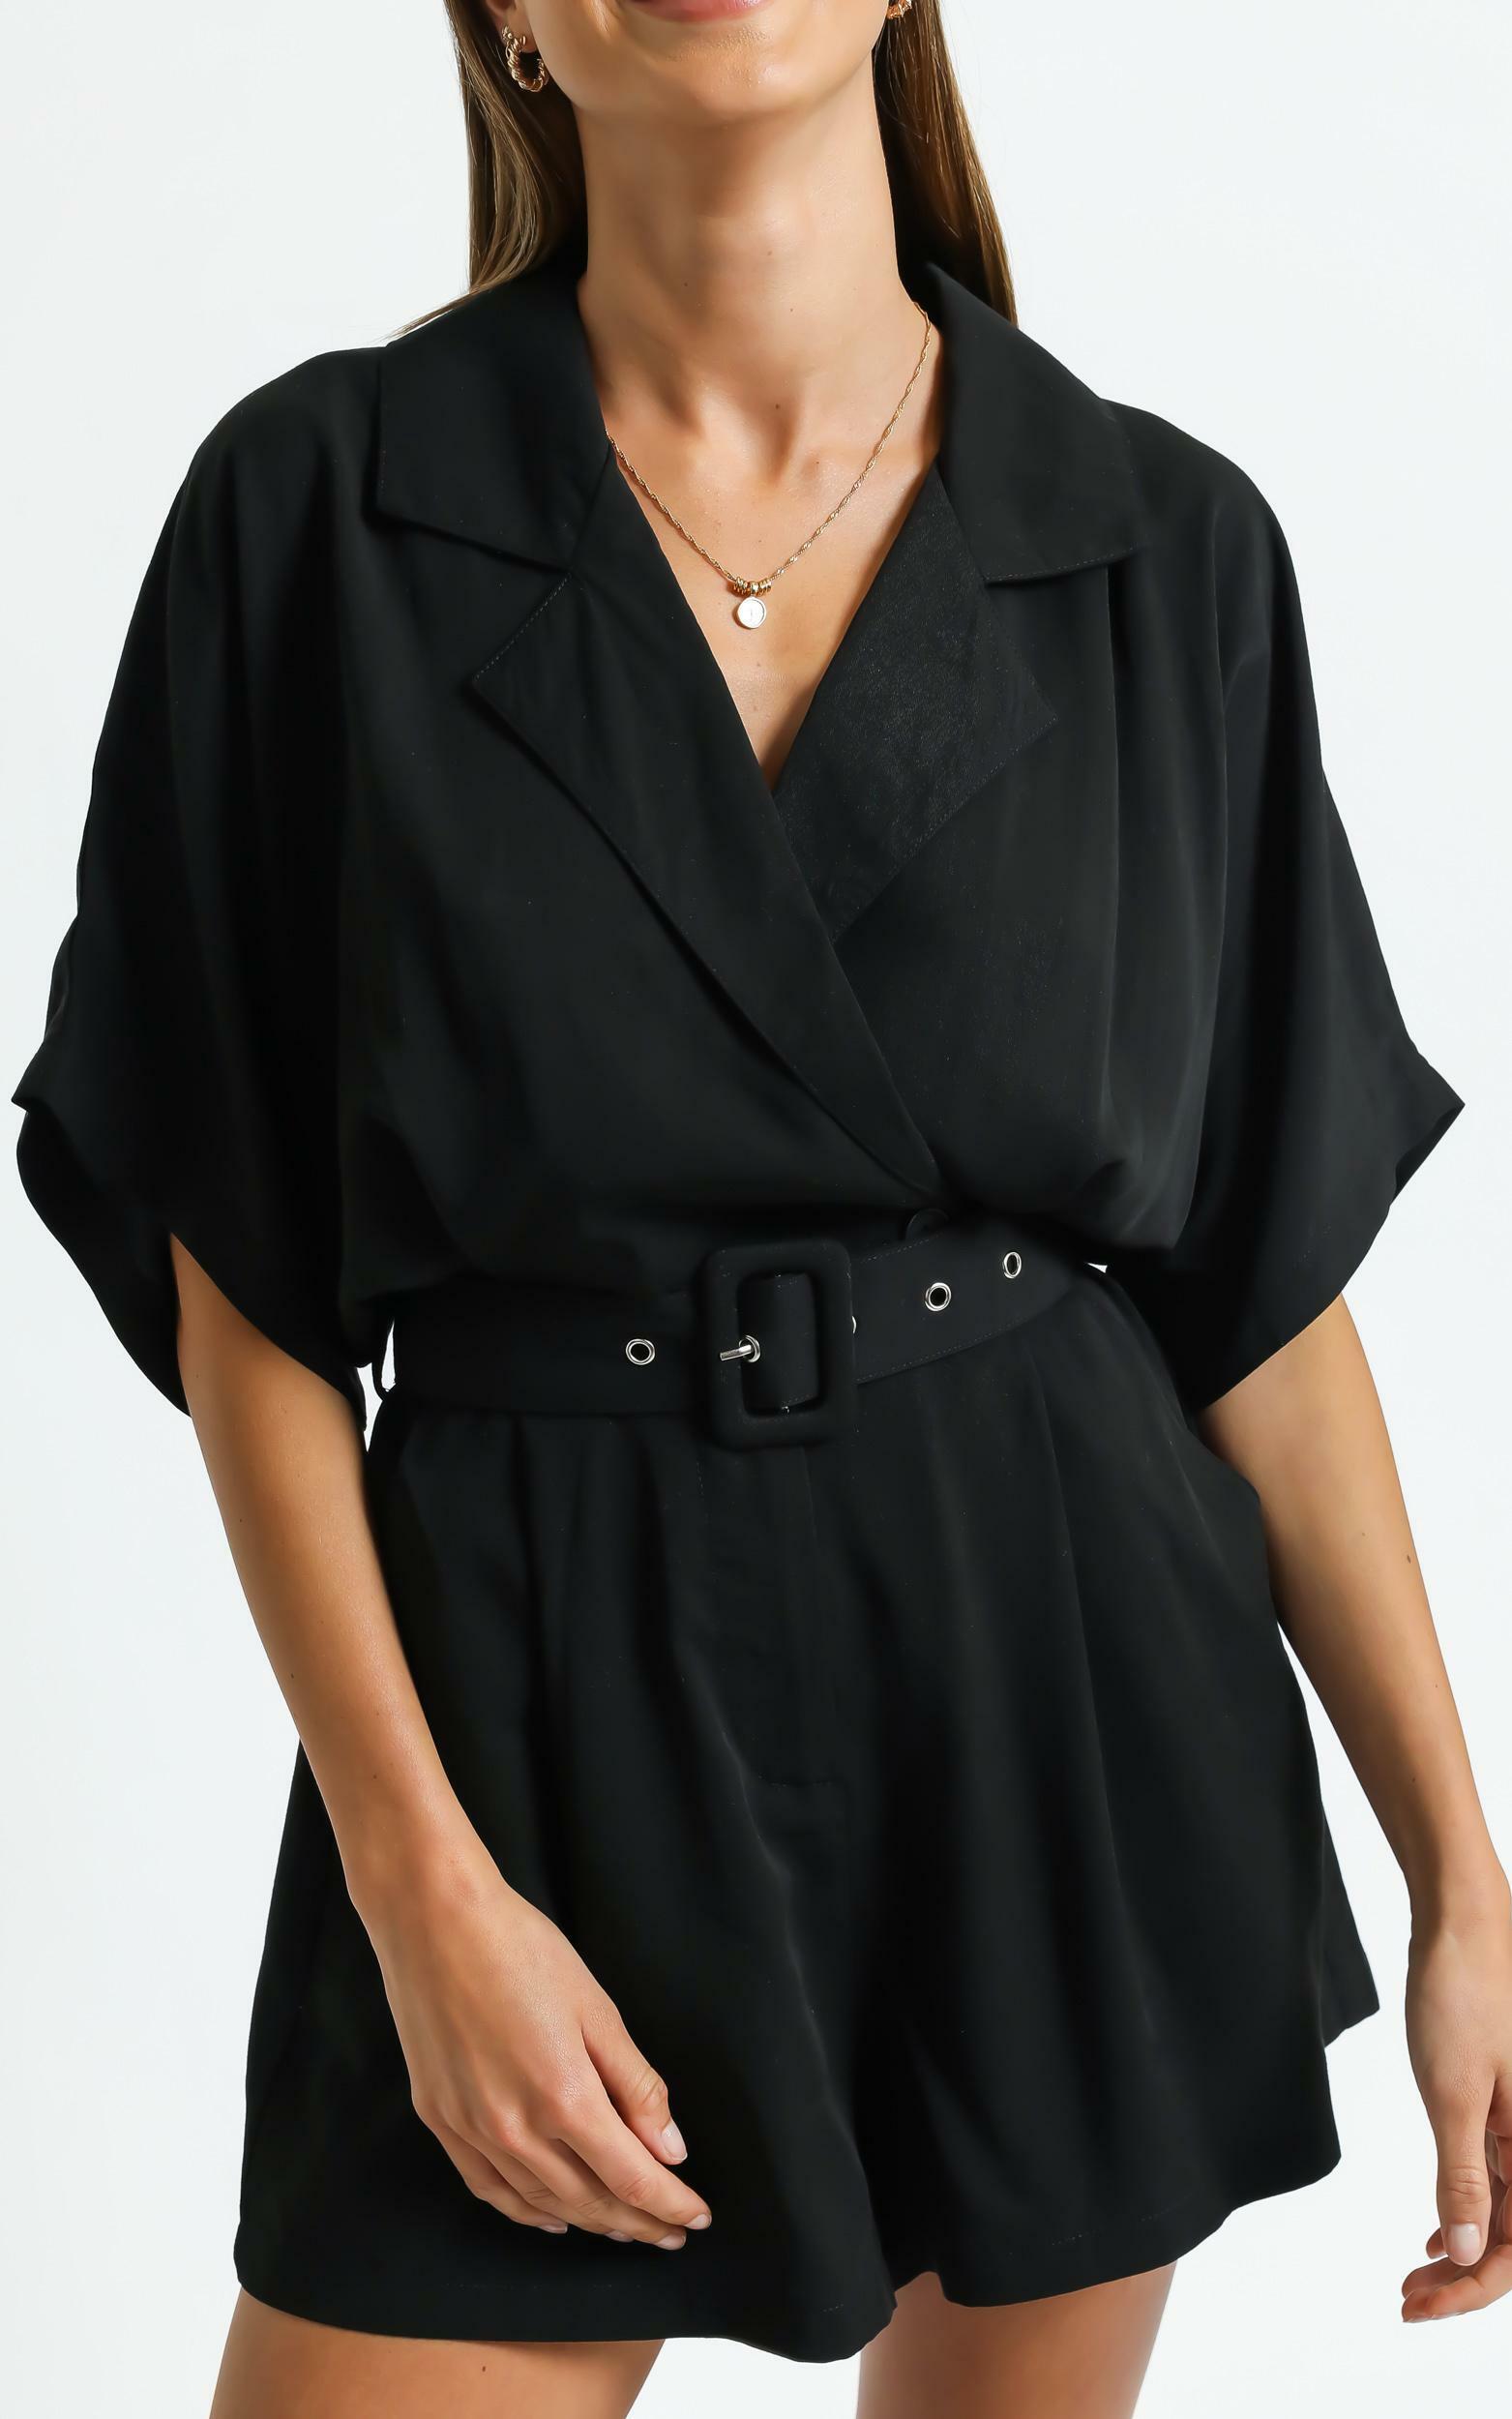 Tonia Playsuit in Black - 6 (XS), Black, hi-res image number null